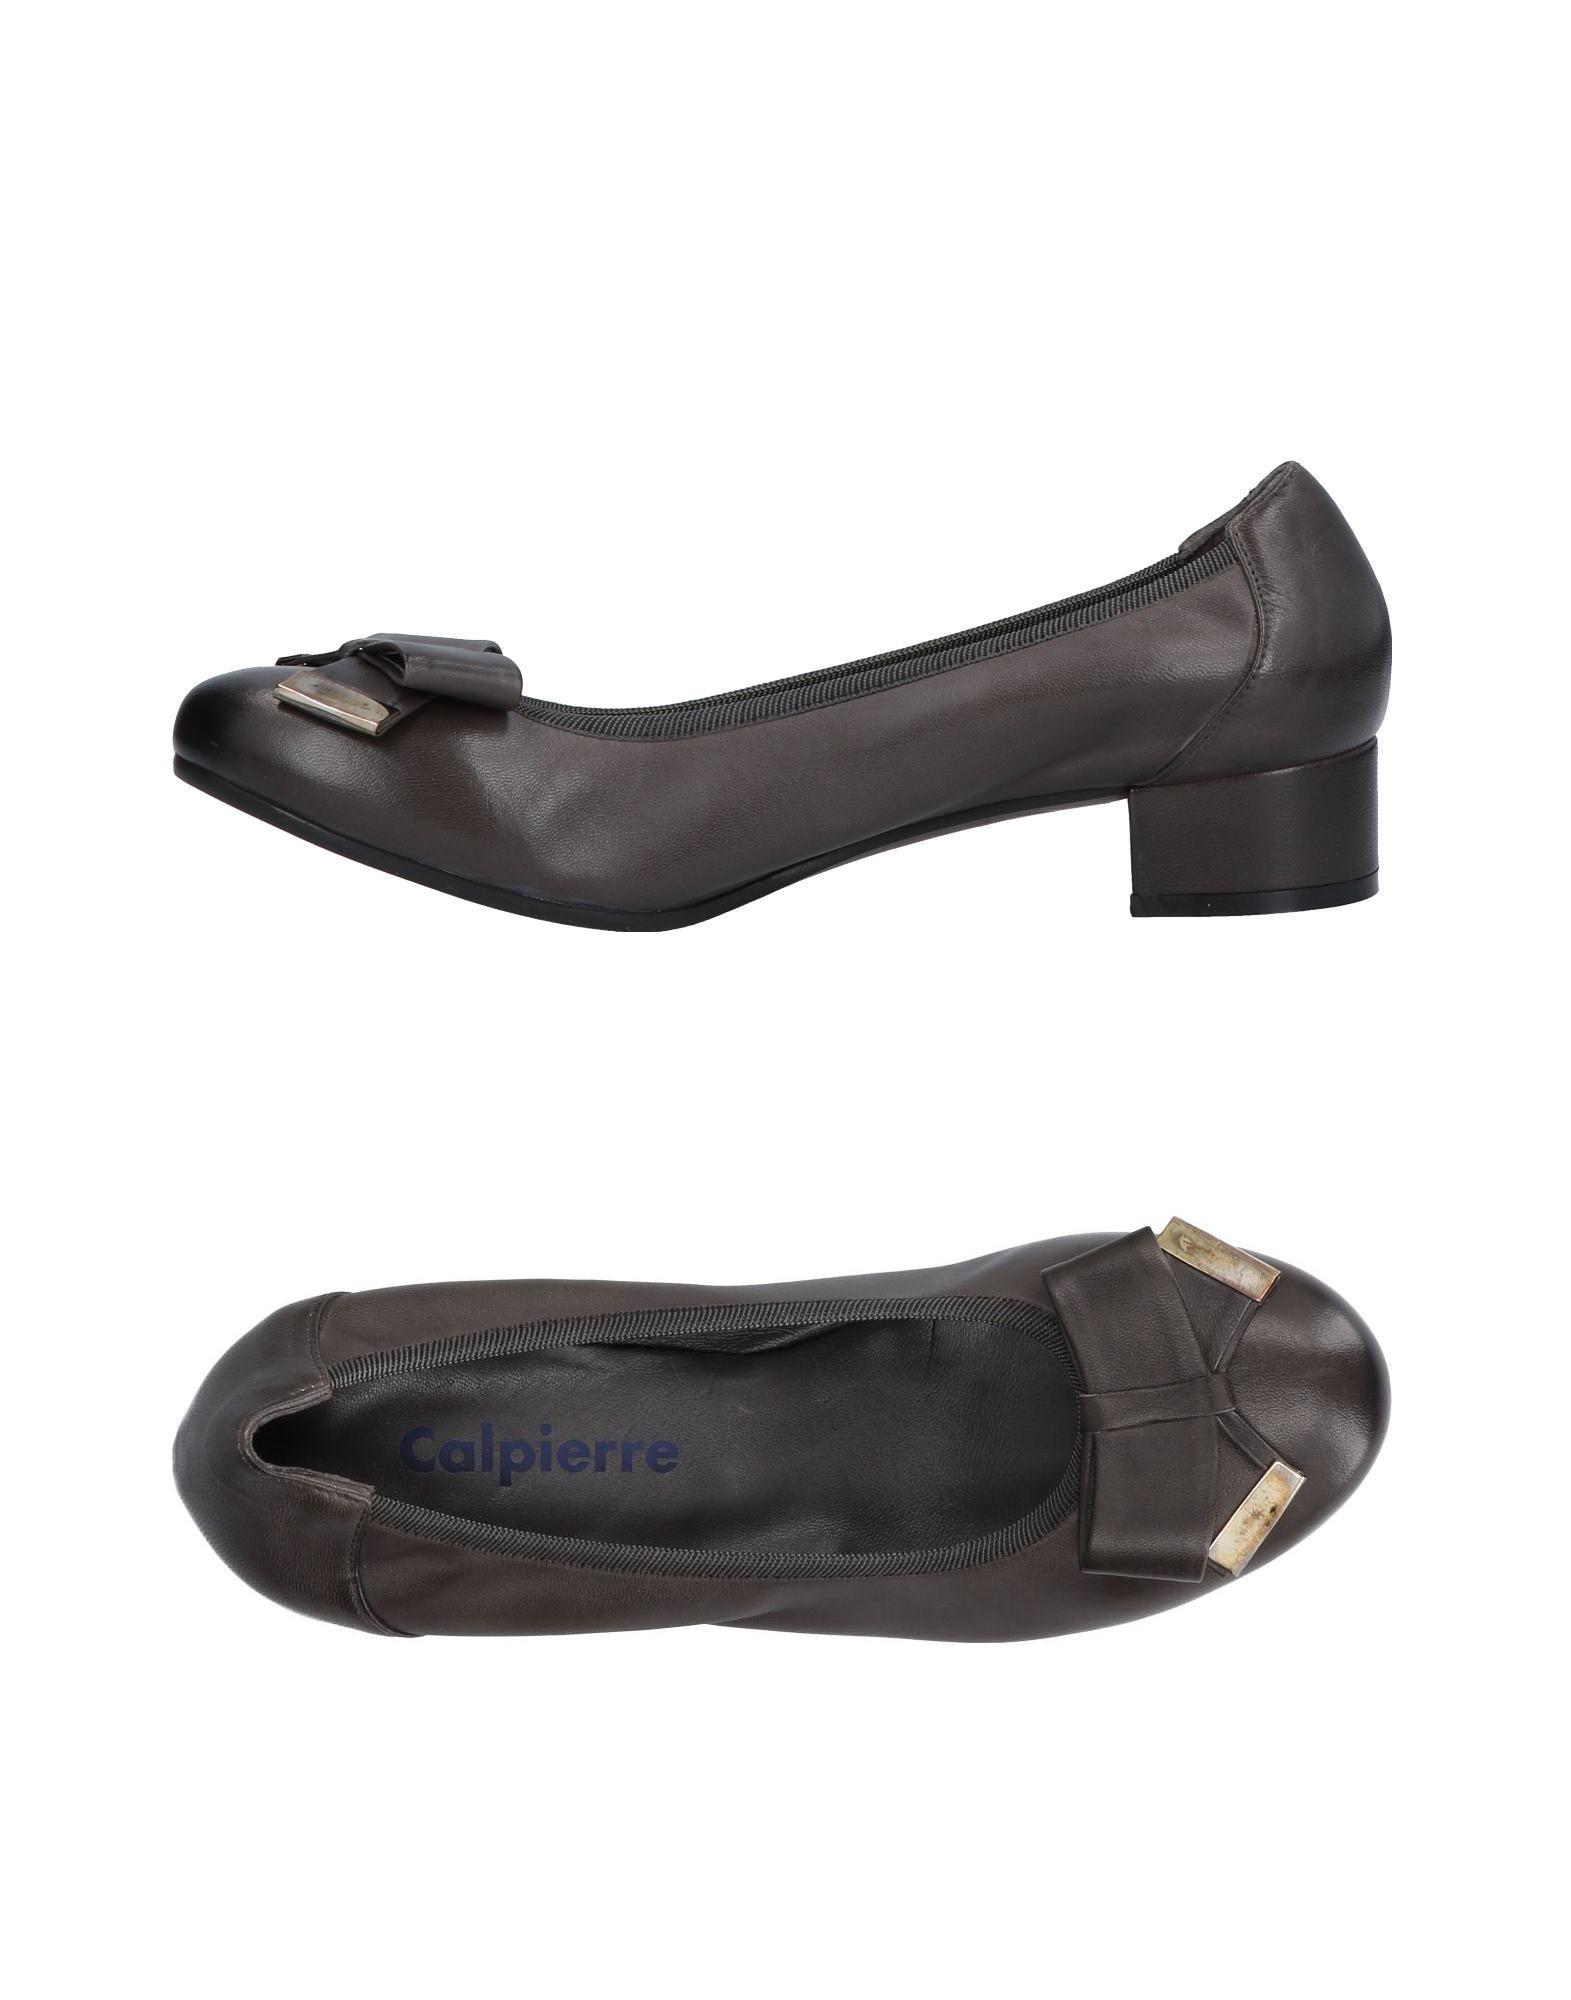 Calpierre Pumps Damen  11459254QH Gute Qualität beliebte Schuhe